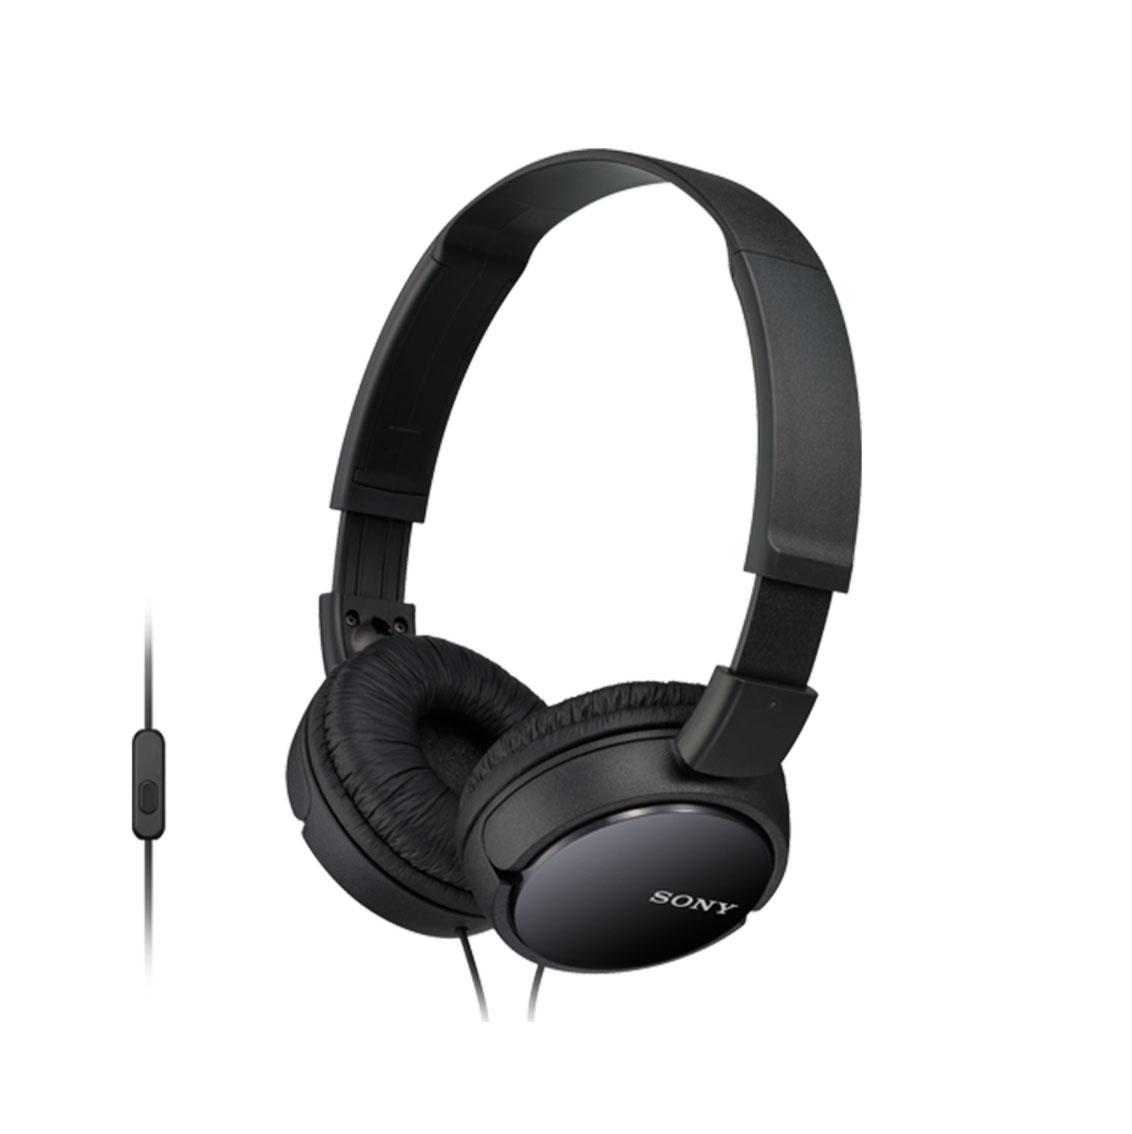 Sony MDR-ZX110APB Headphones Black